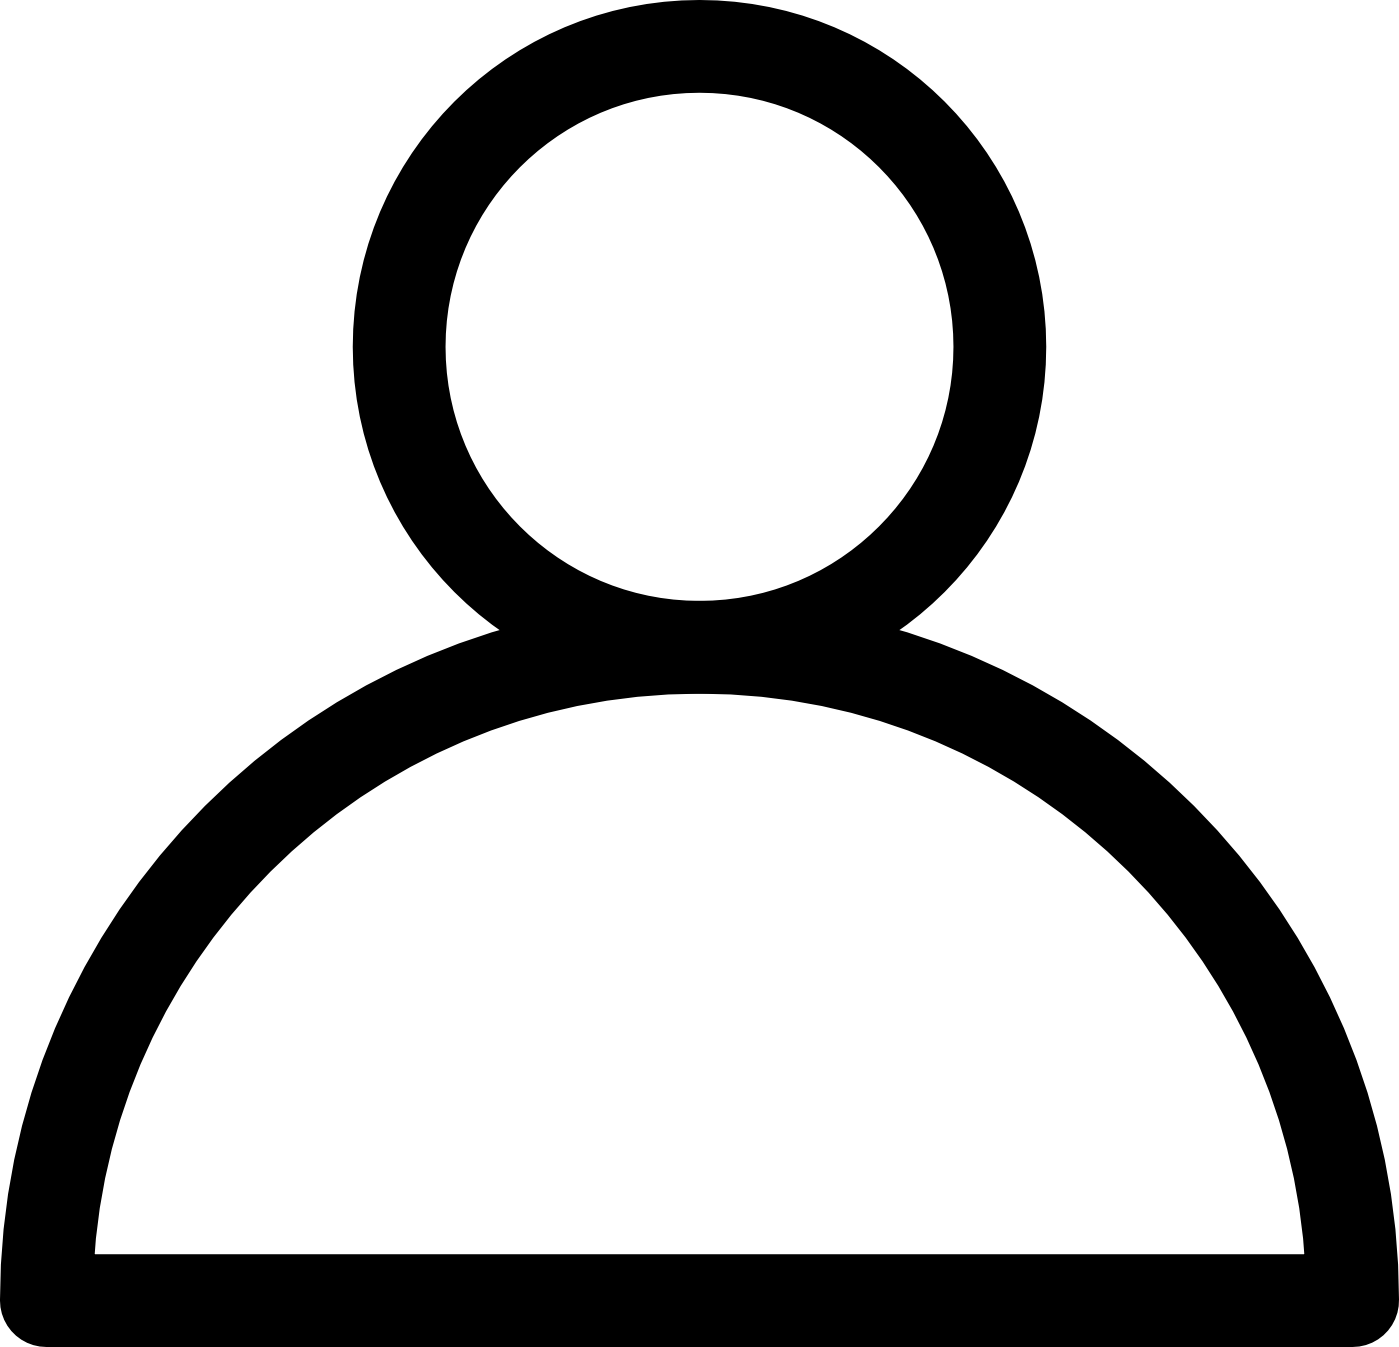 mbutor.hu - asztalos-konyhabútor-bútor